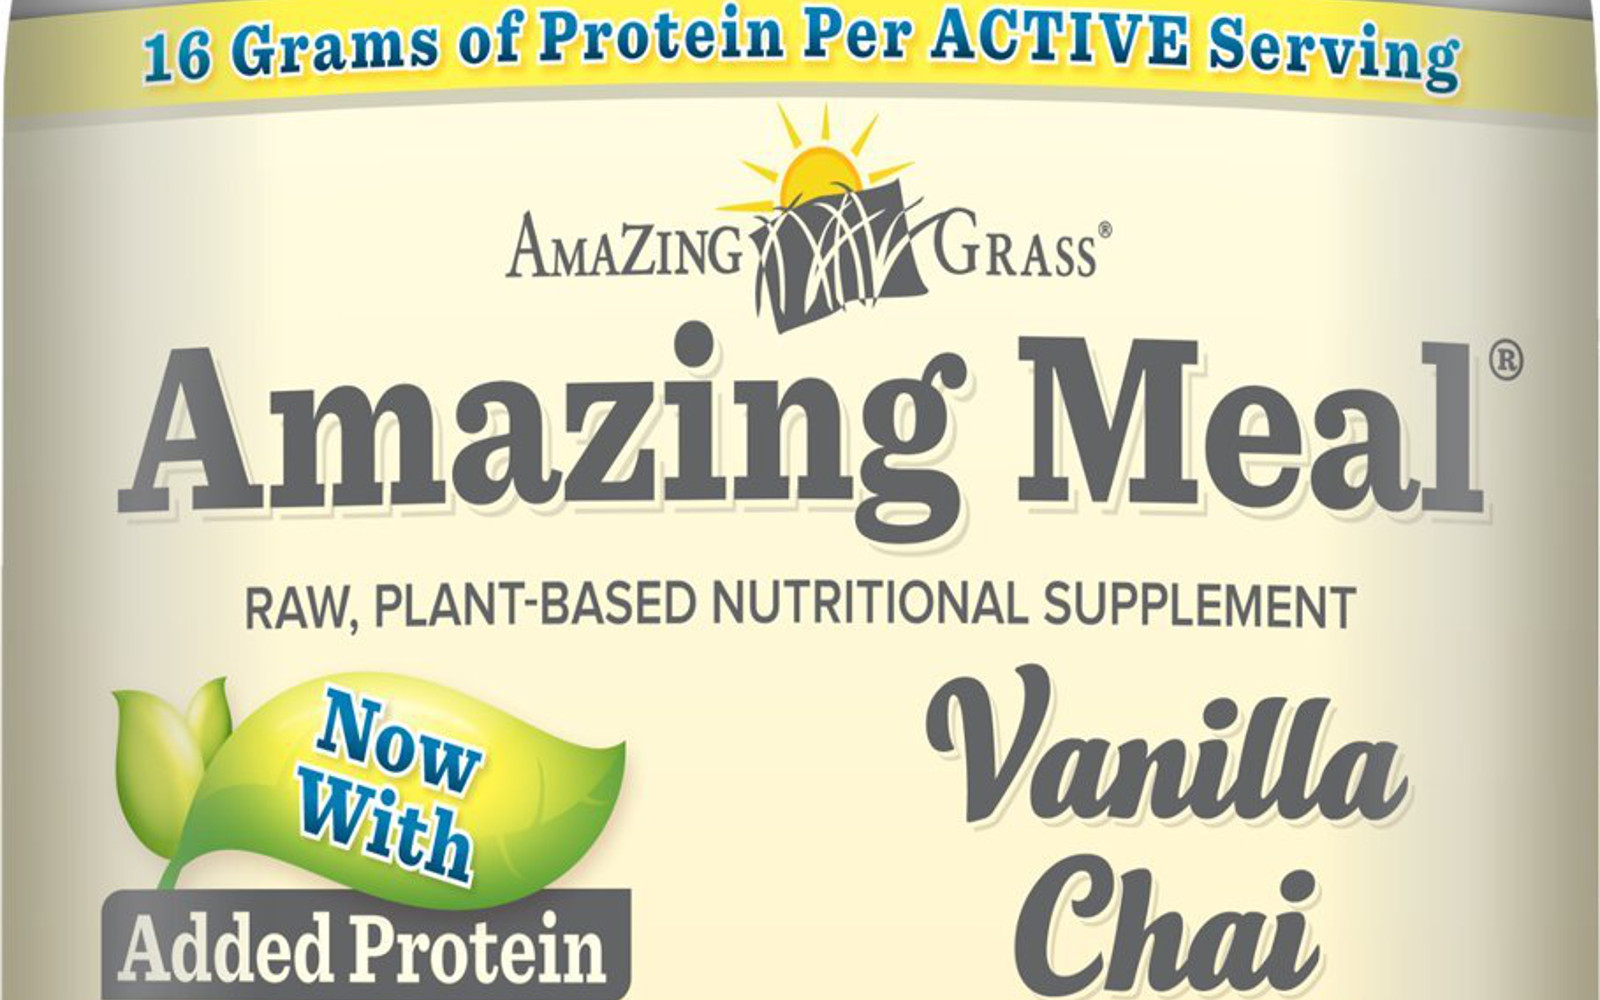 (2 Pack) Purely Inspired Organic Vegan Protein Powder